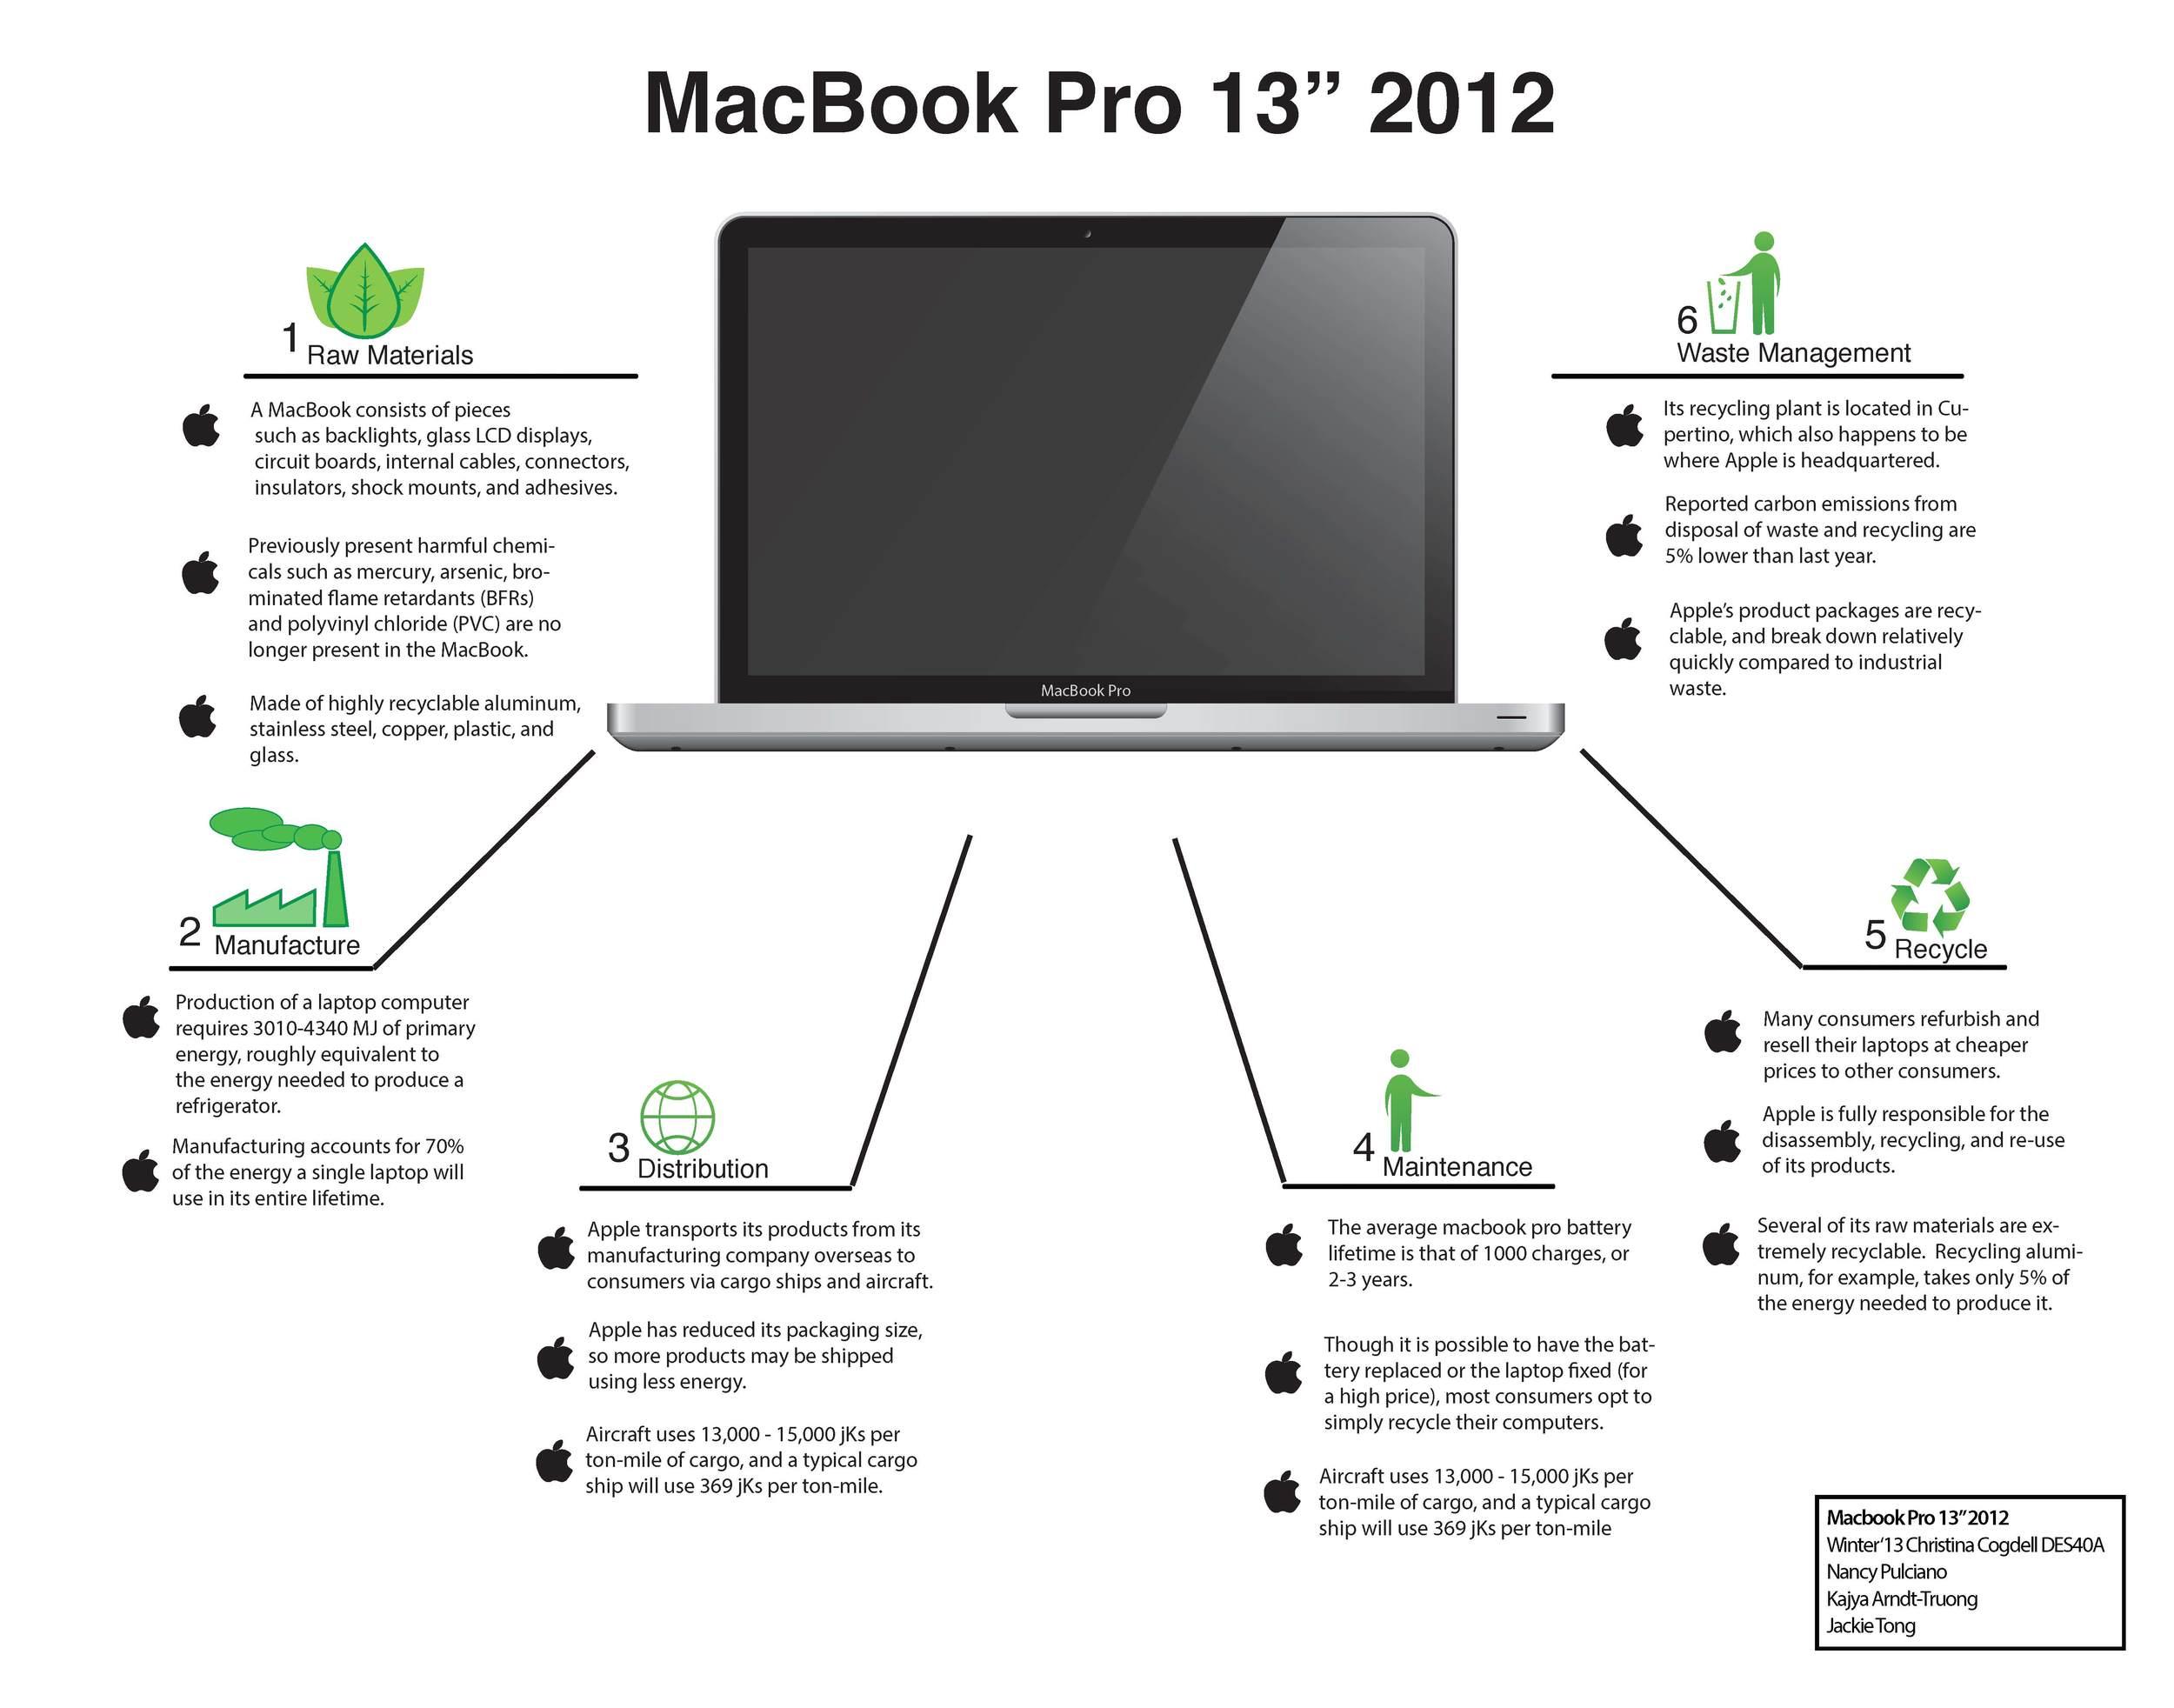 Macbook Pro 2012 — Design Life-Cycle